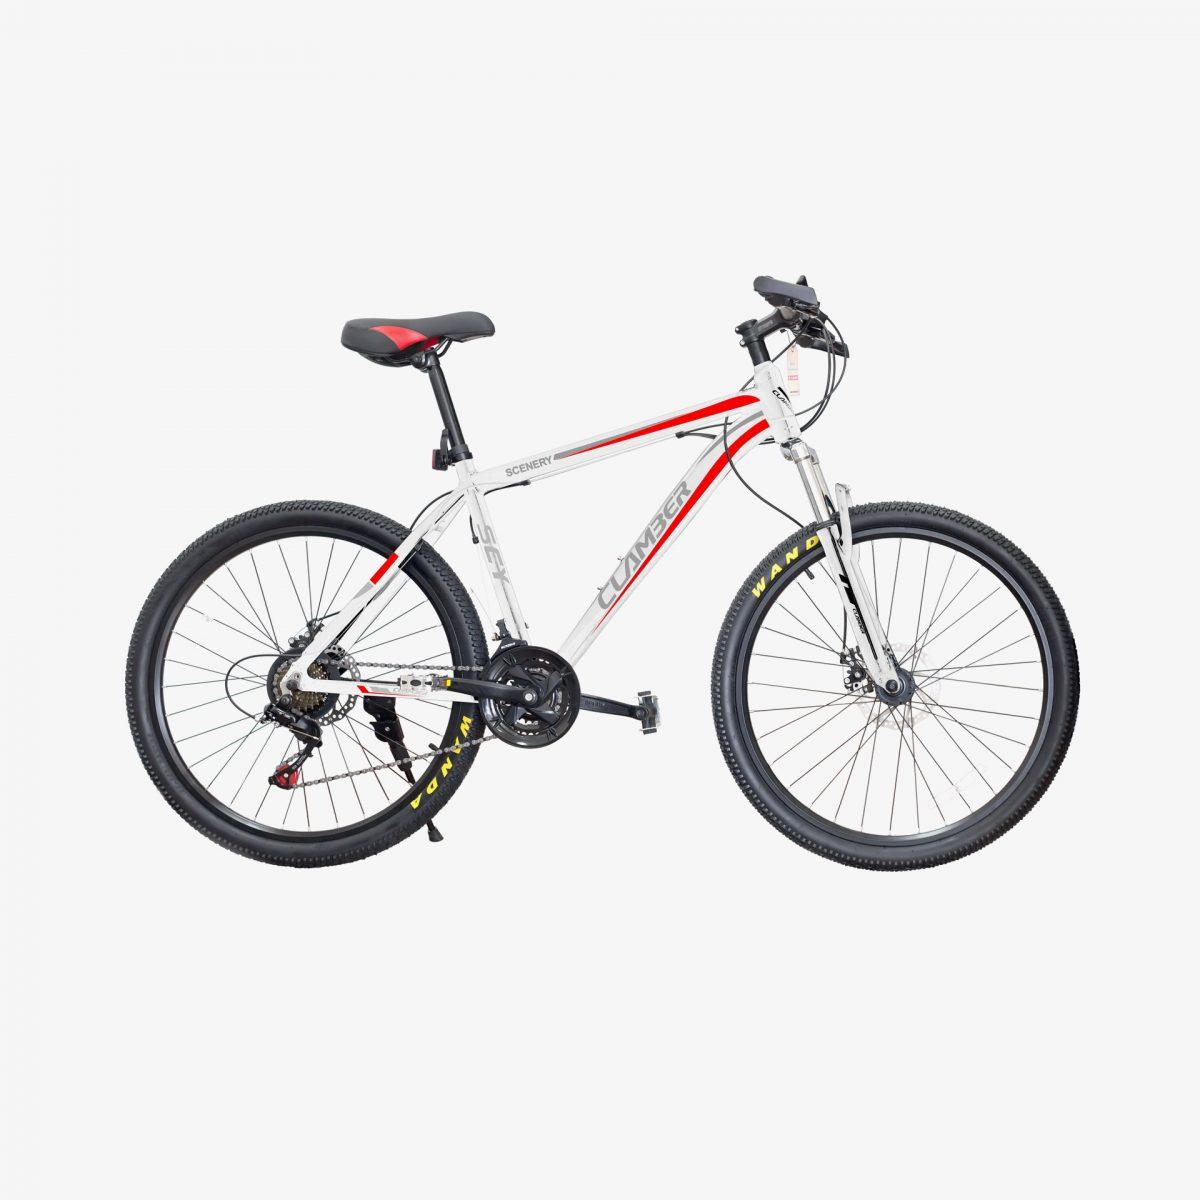 home_biker_product_1920x1920_2